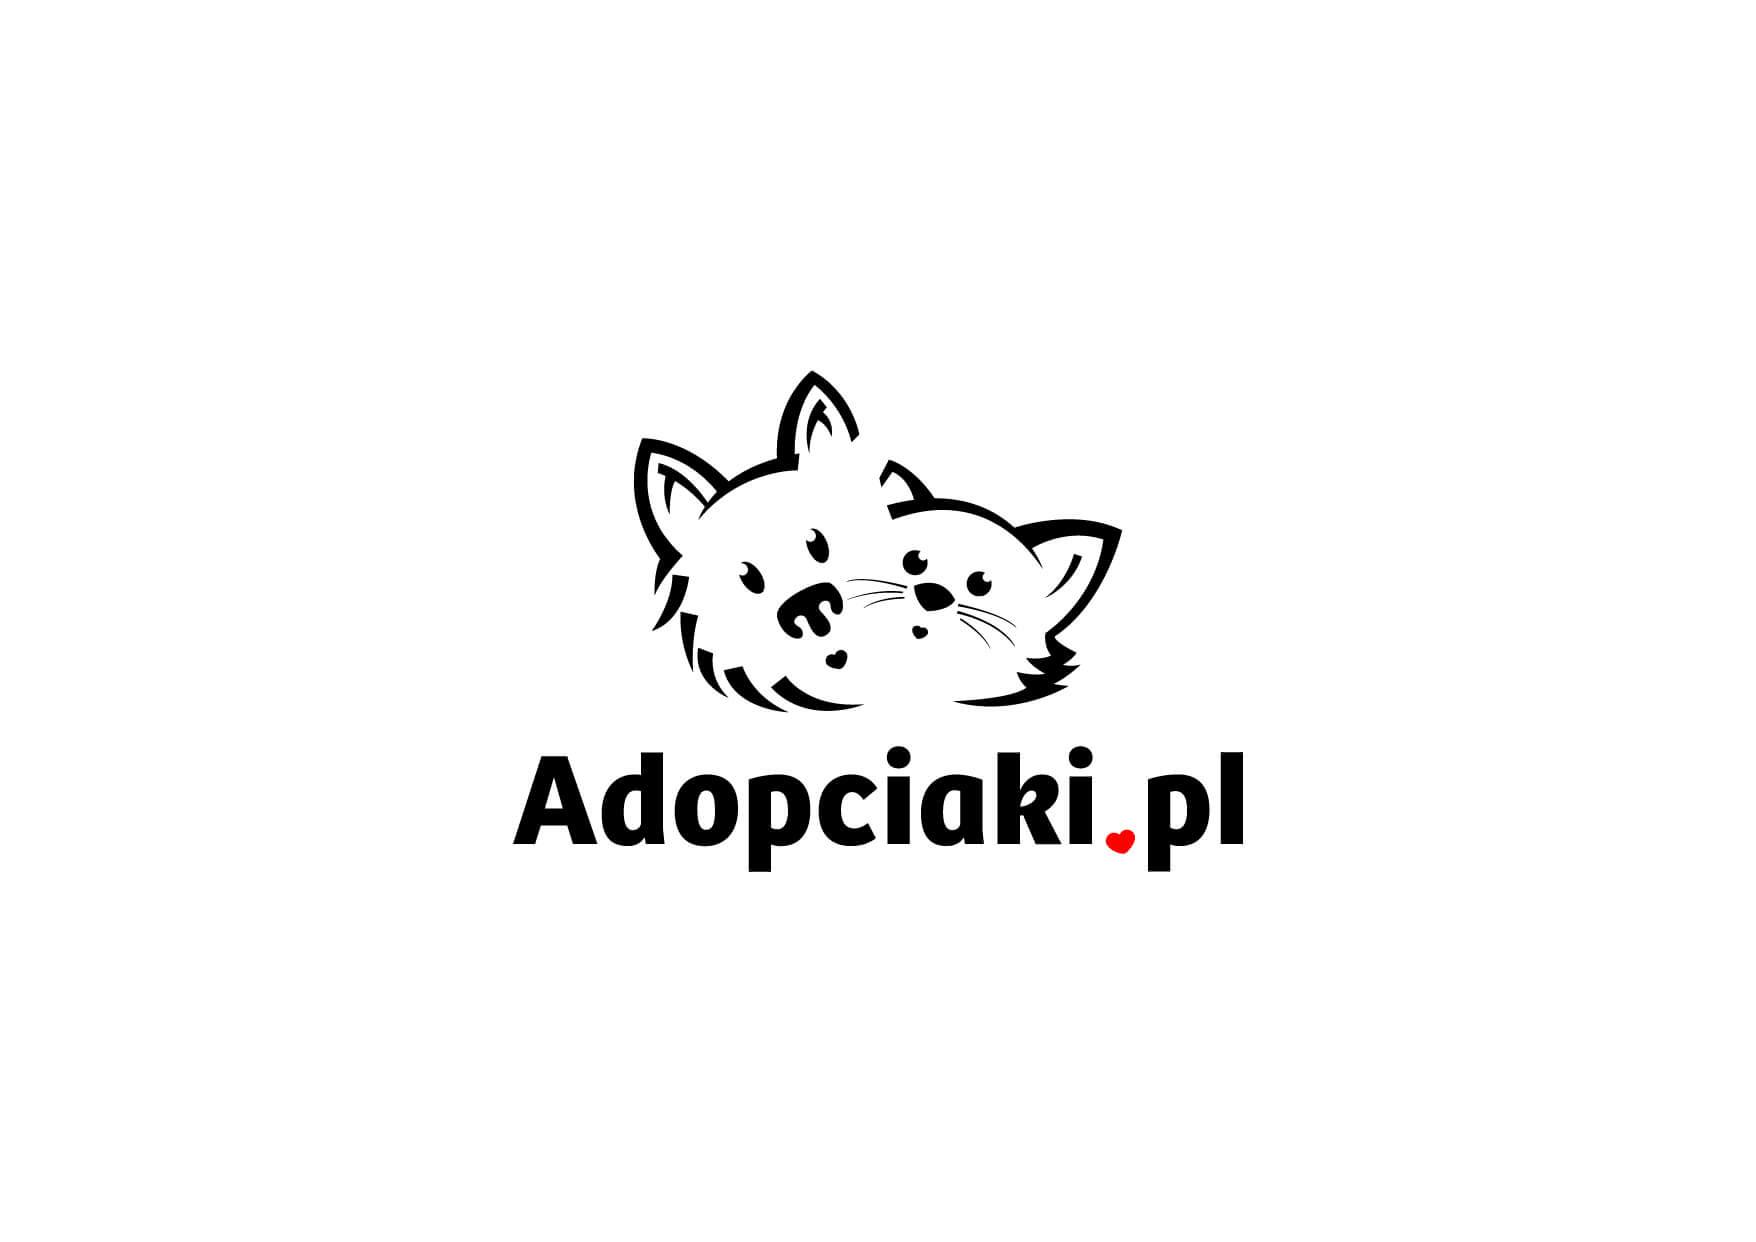 Logo Adopciaki.pl – Marki